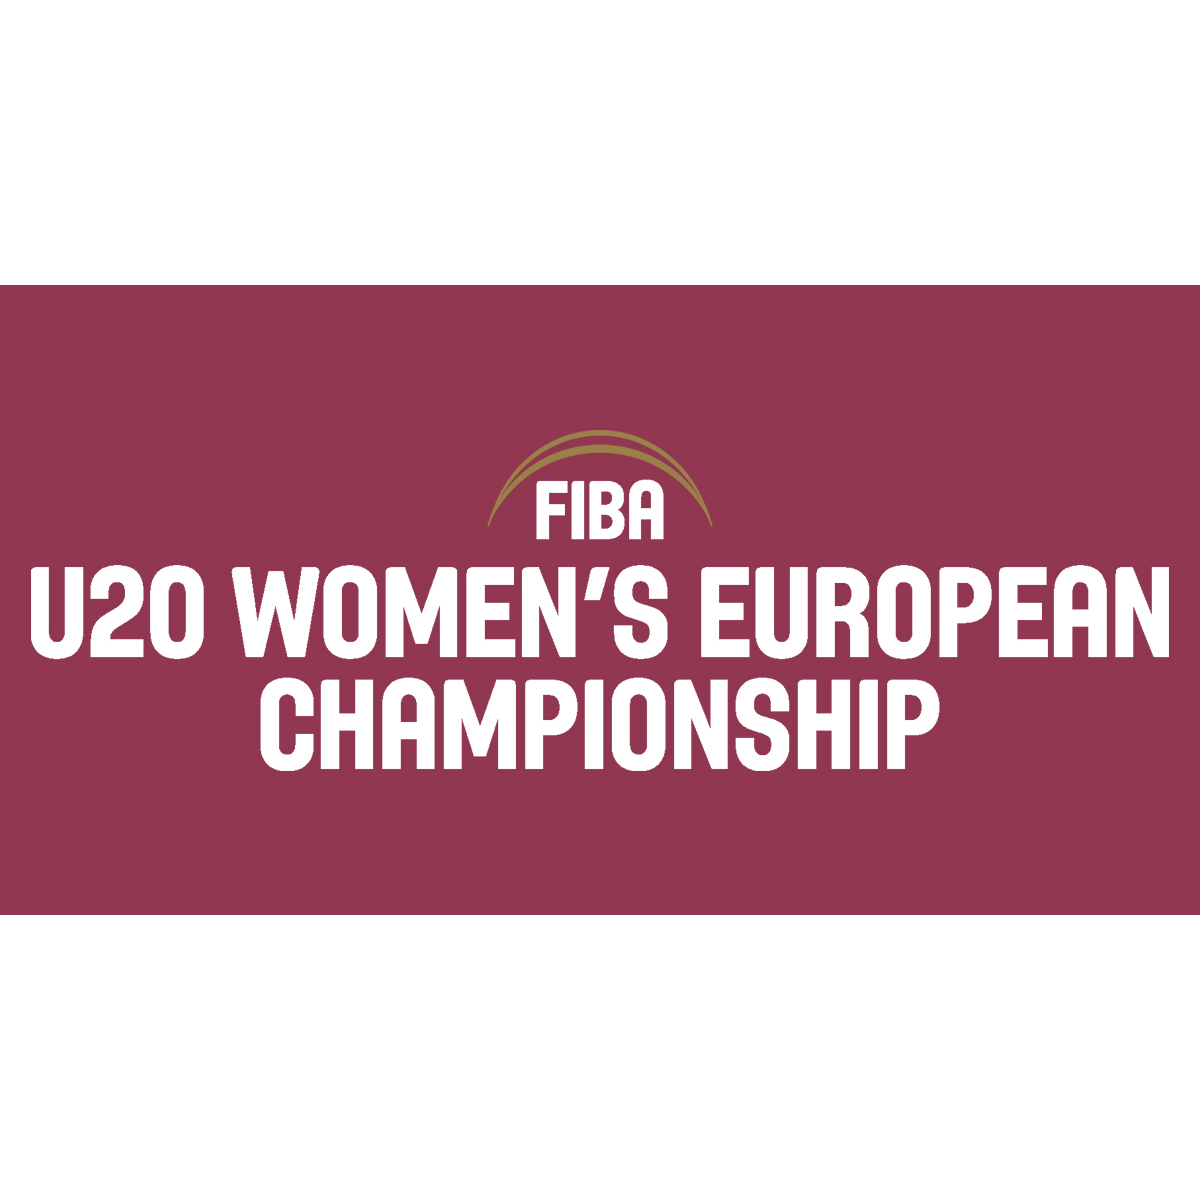 2018 FIBA U20 Women's European Basketball Championship - Division B